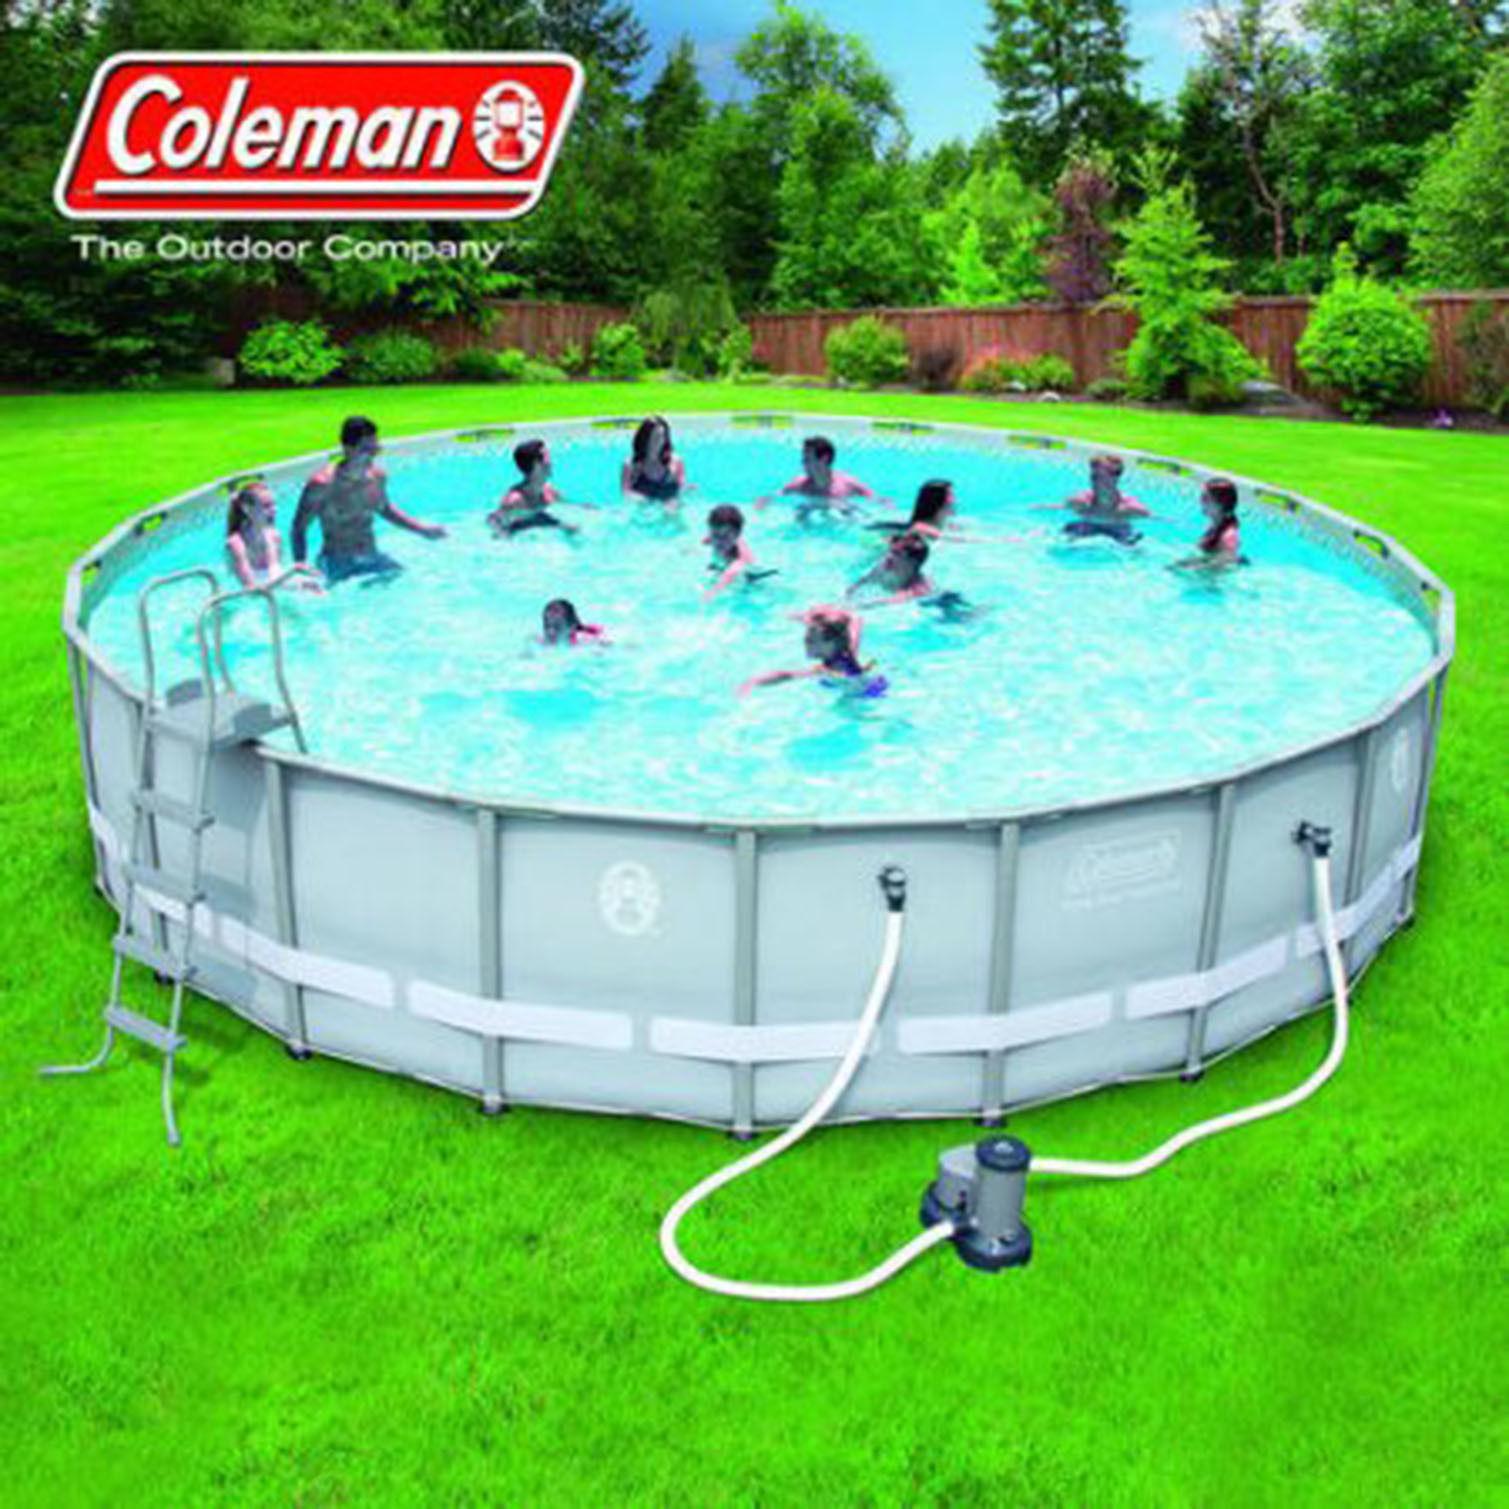 Coleman Swimming Pool 2 Customer Reviews And 4 Listings